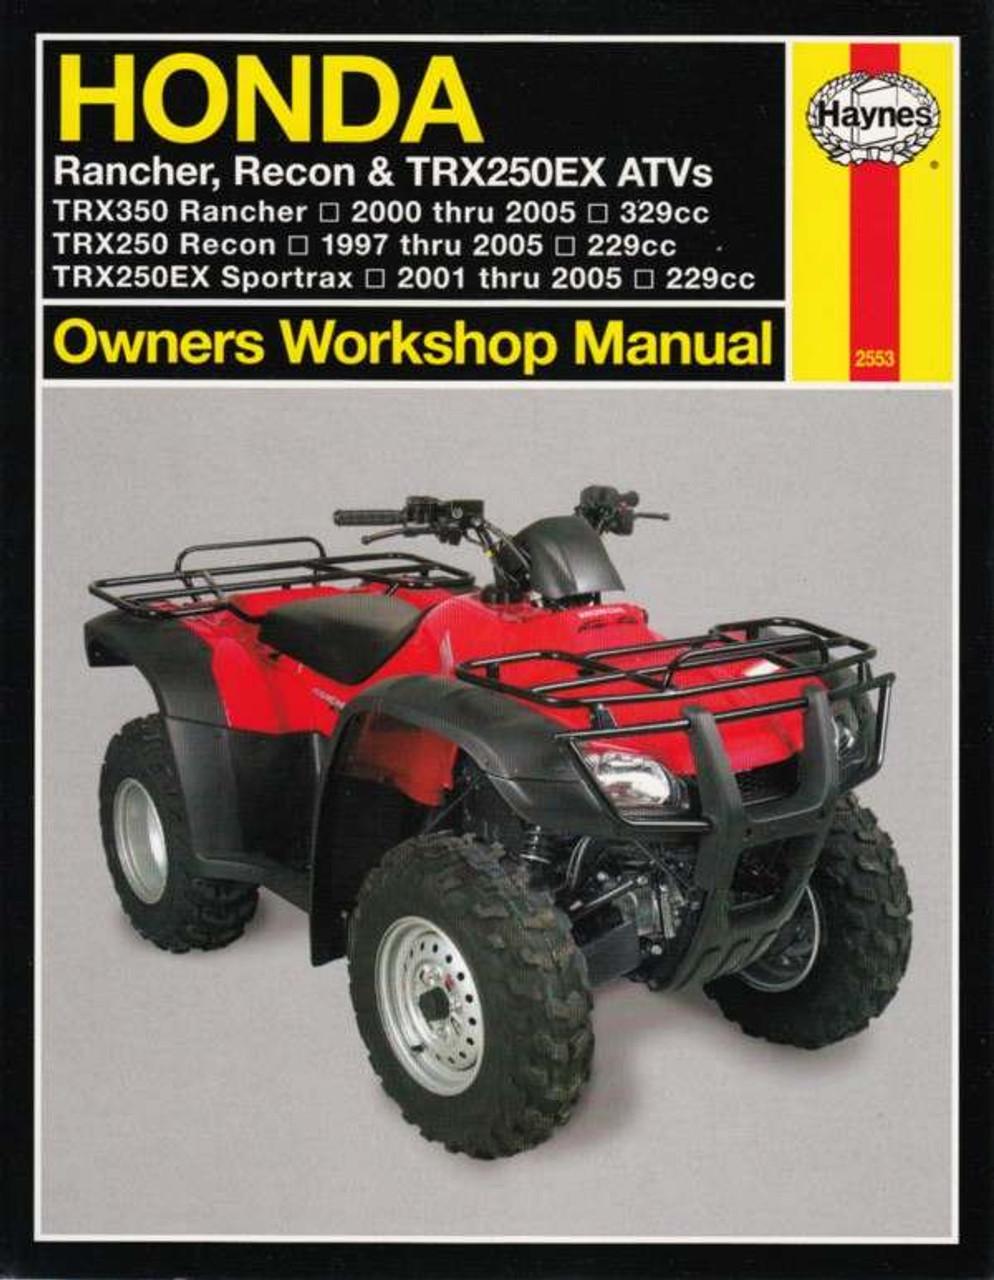 medium resolution of honda rancher recon trx250ex atvs 1997 2005 workshop manual honda trx350 rancher trx250